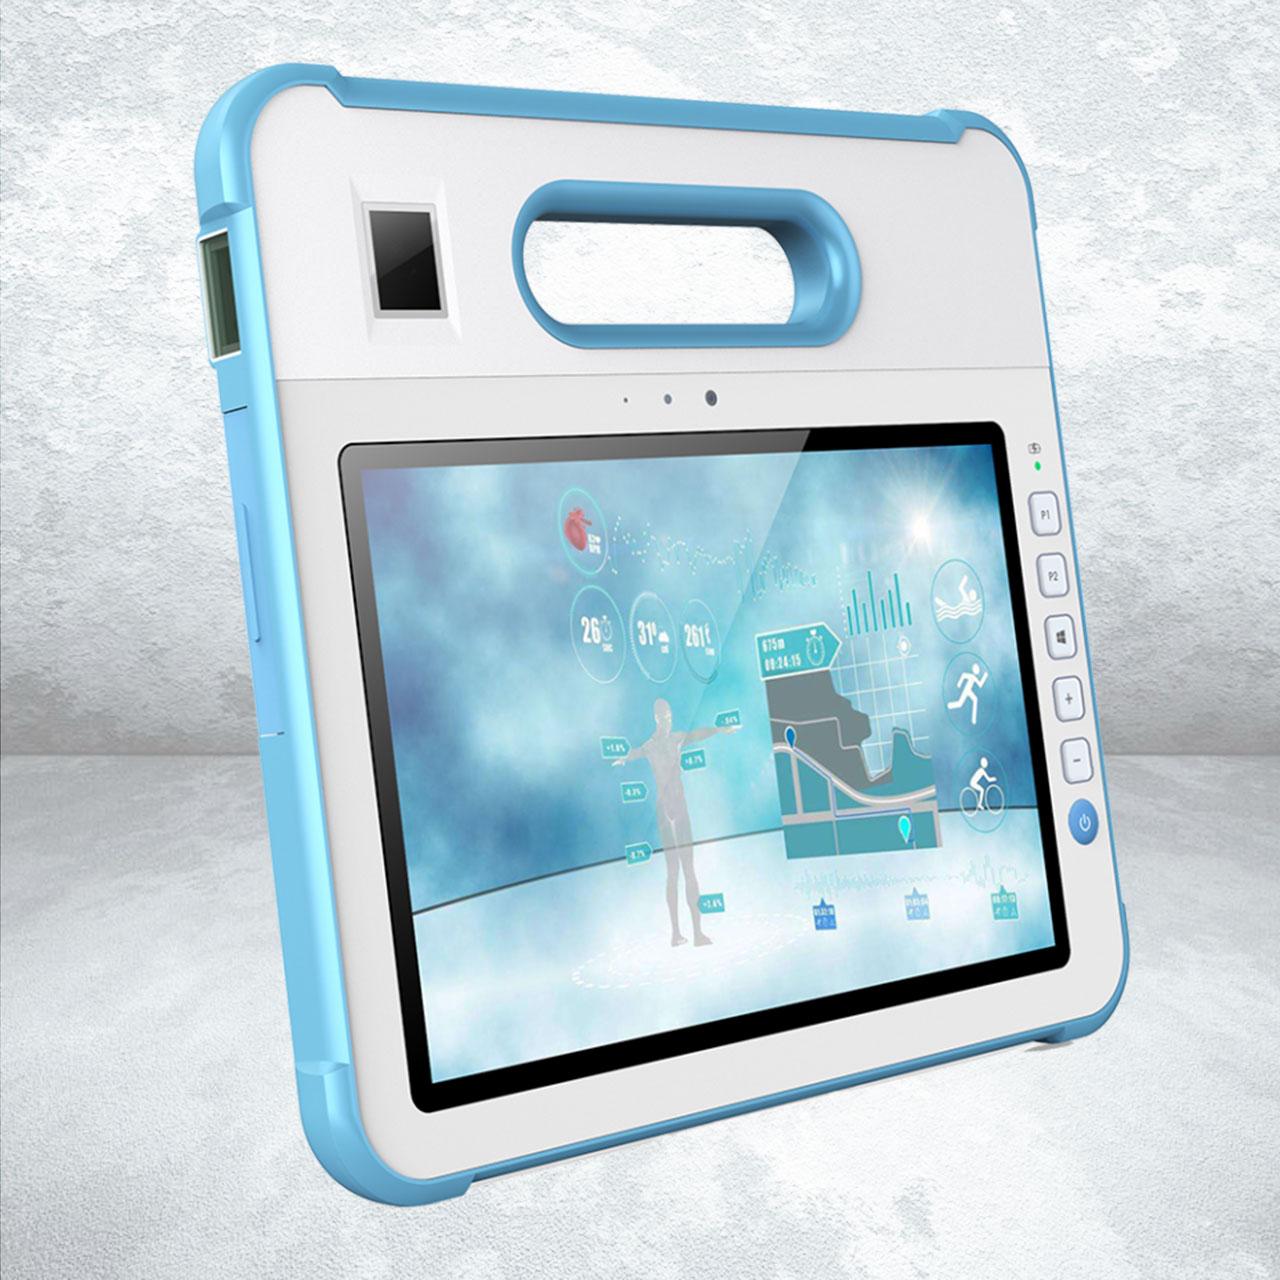 Tablette CW10a